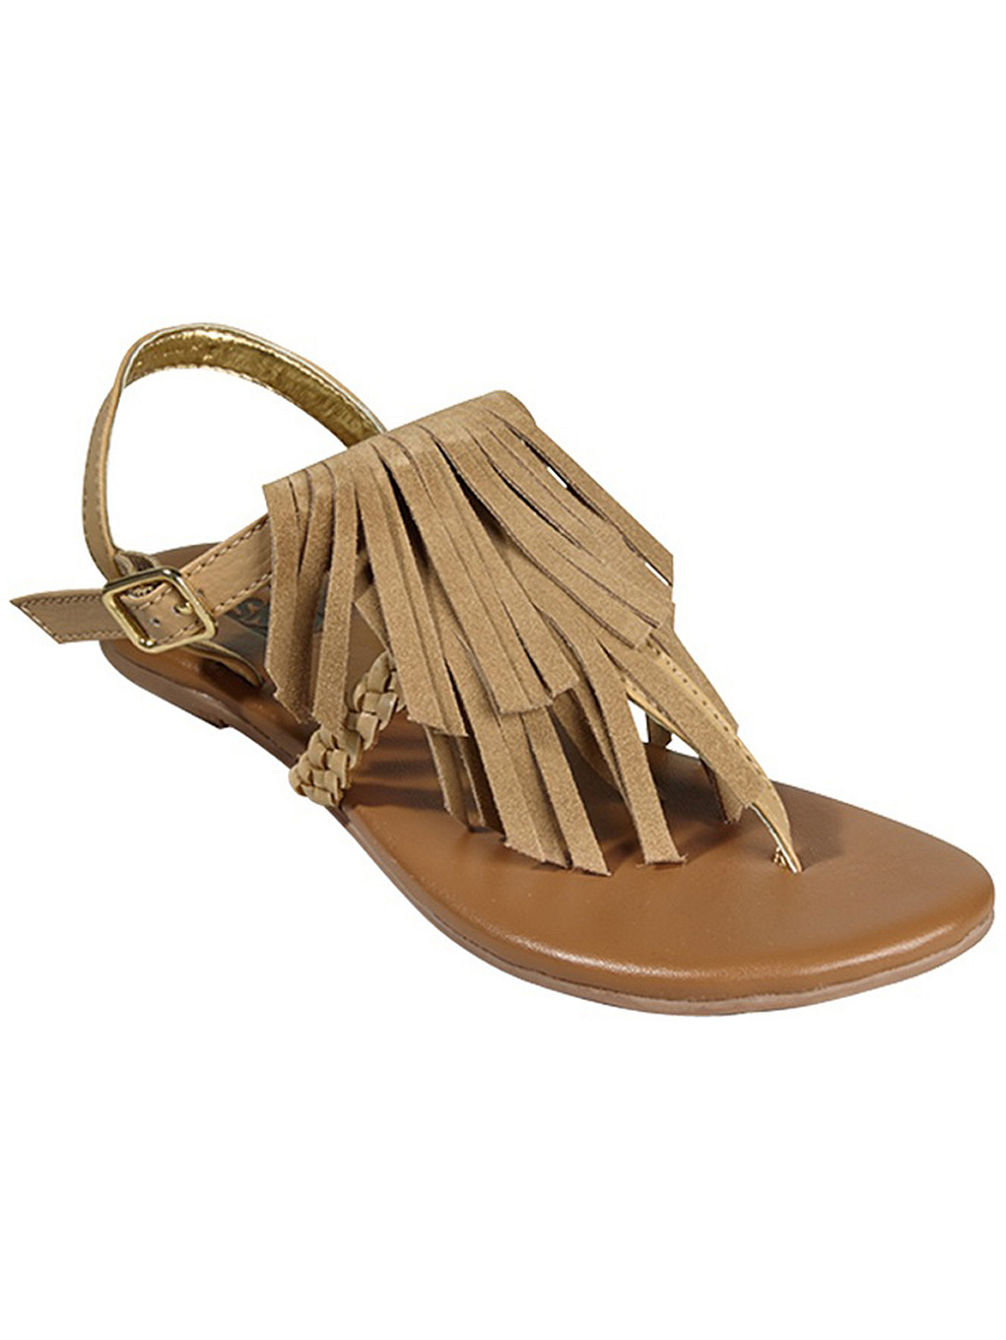 68a4be79ee603e Buy Vans Kihana Fringe Sandals Women online at Blue Tomato